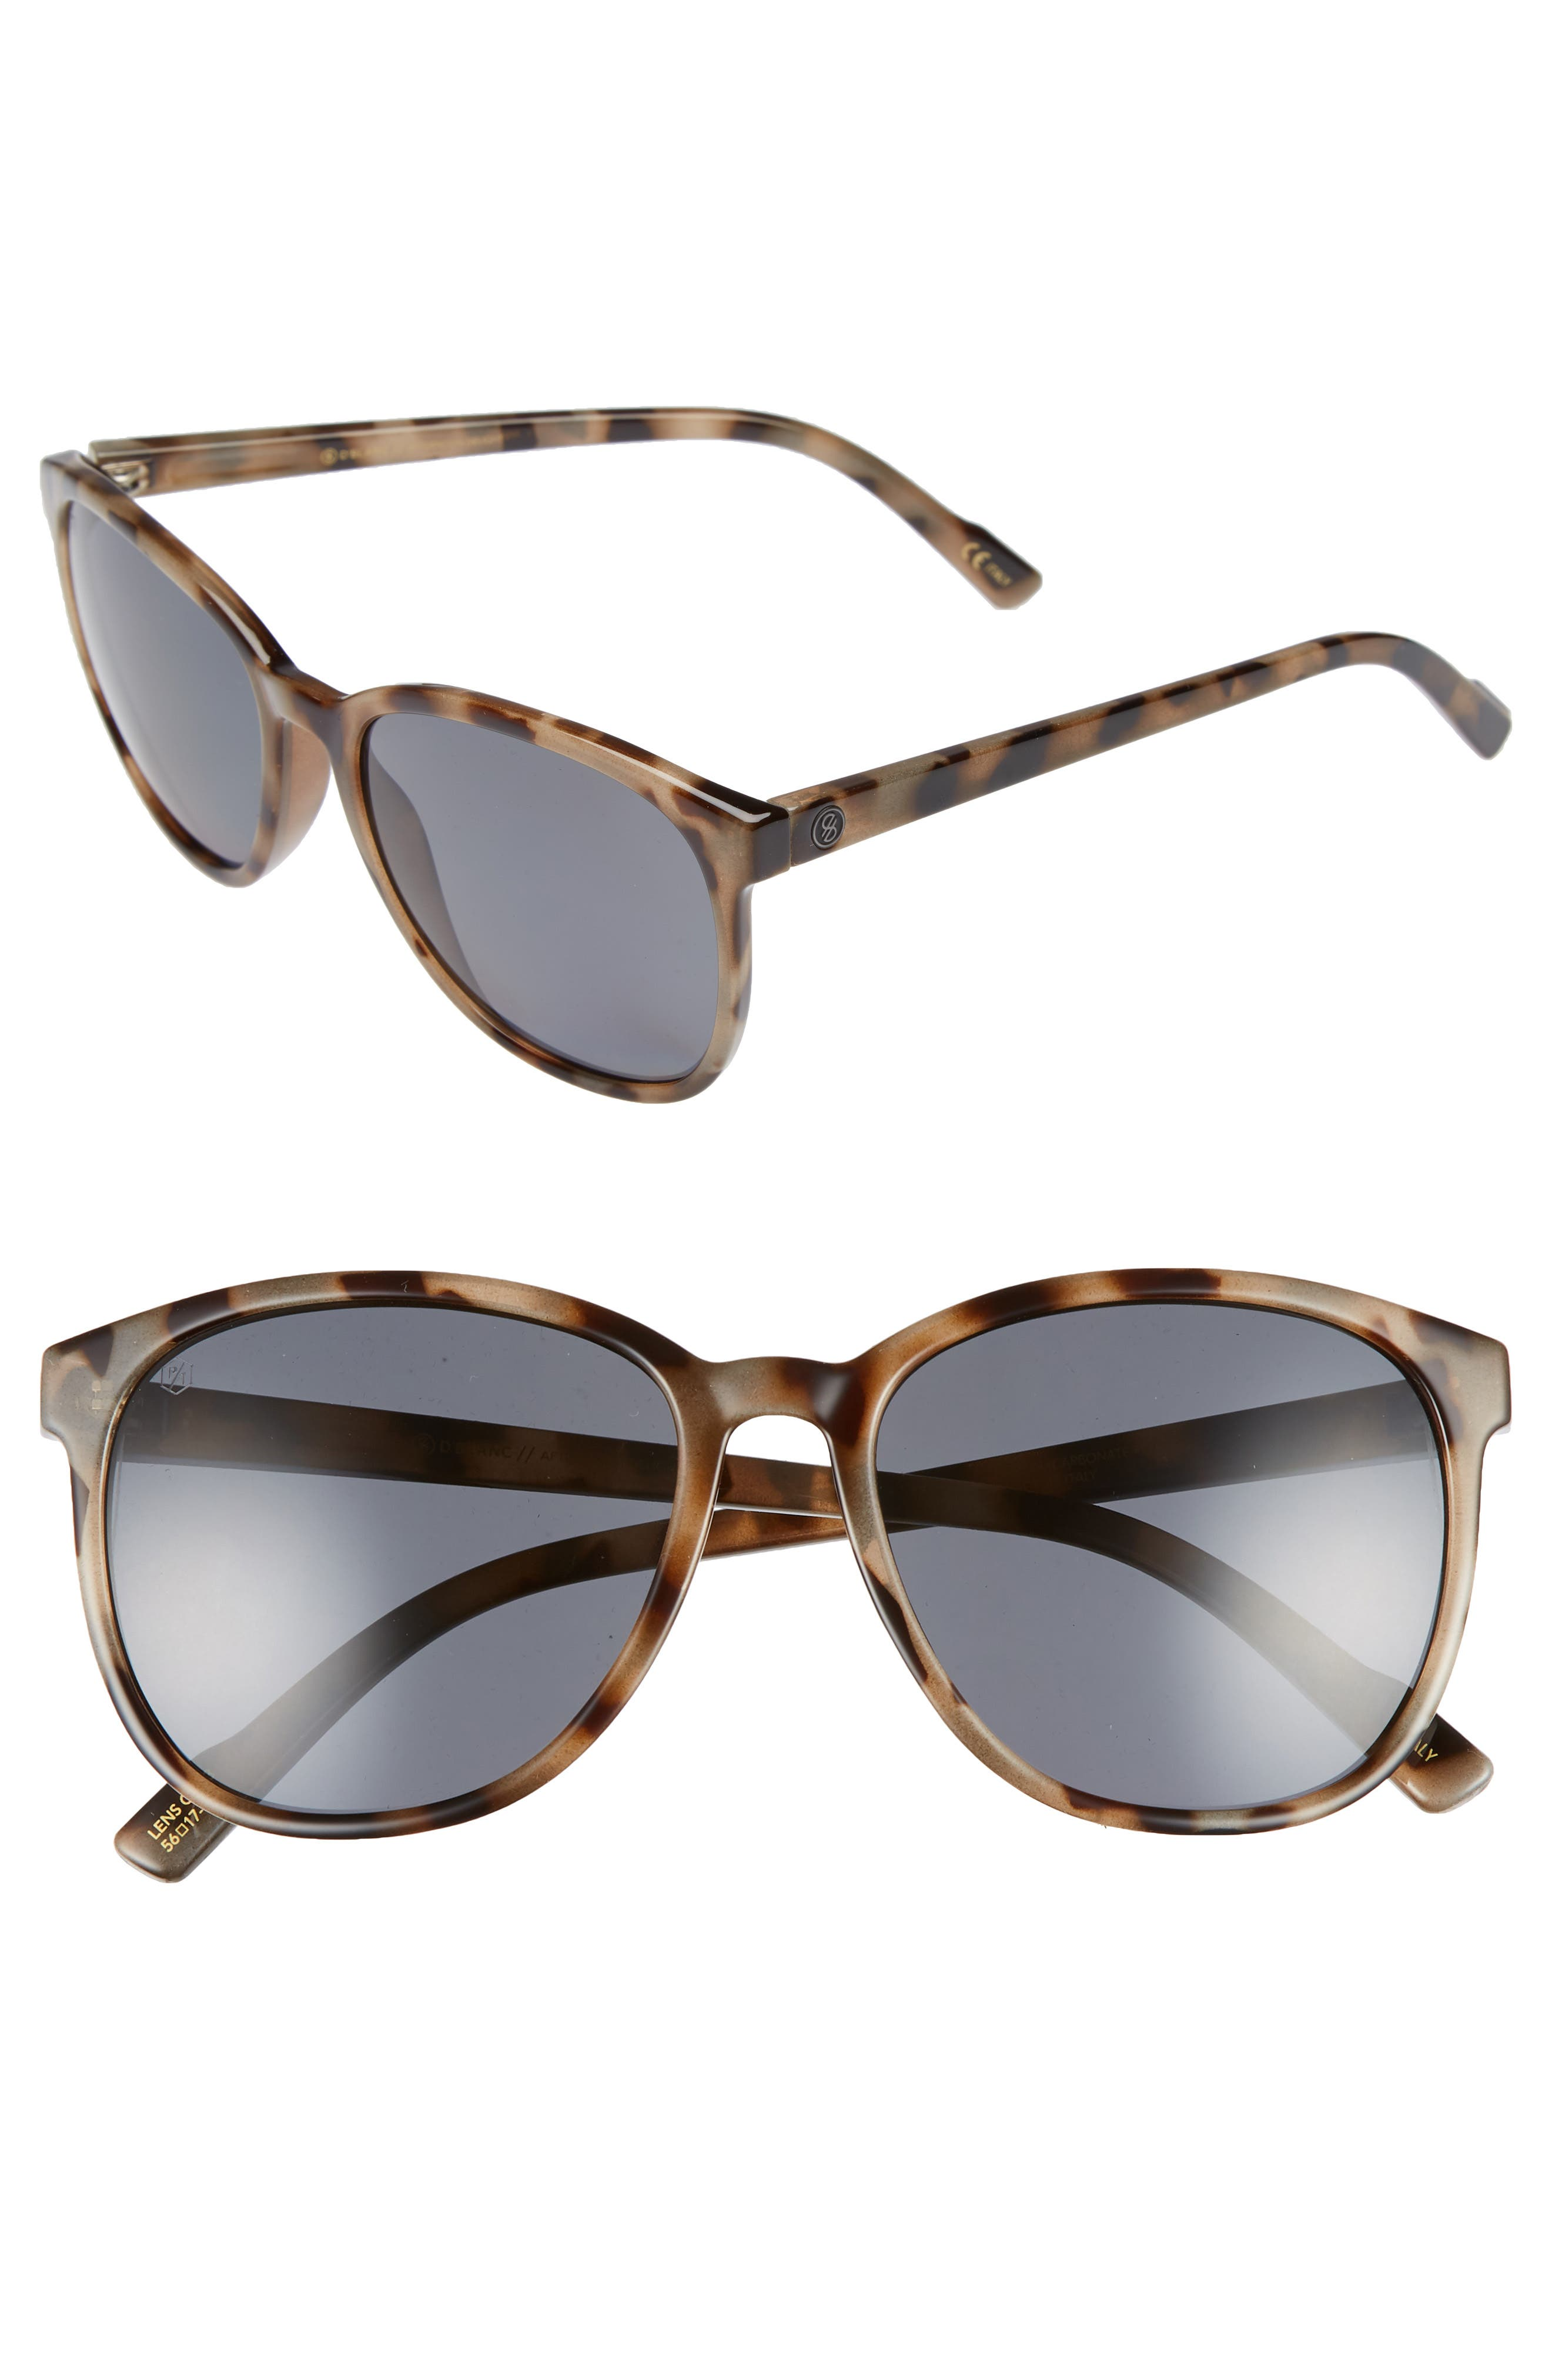 D'BLANC Afternoon Delight 56mm Polarized Sunglasses,                             Main thumbnail 1, color,                             Snow Leopard/ Grey Polar